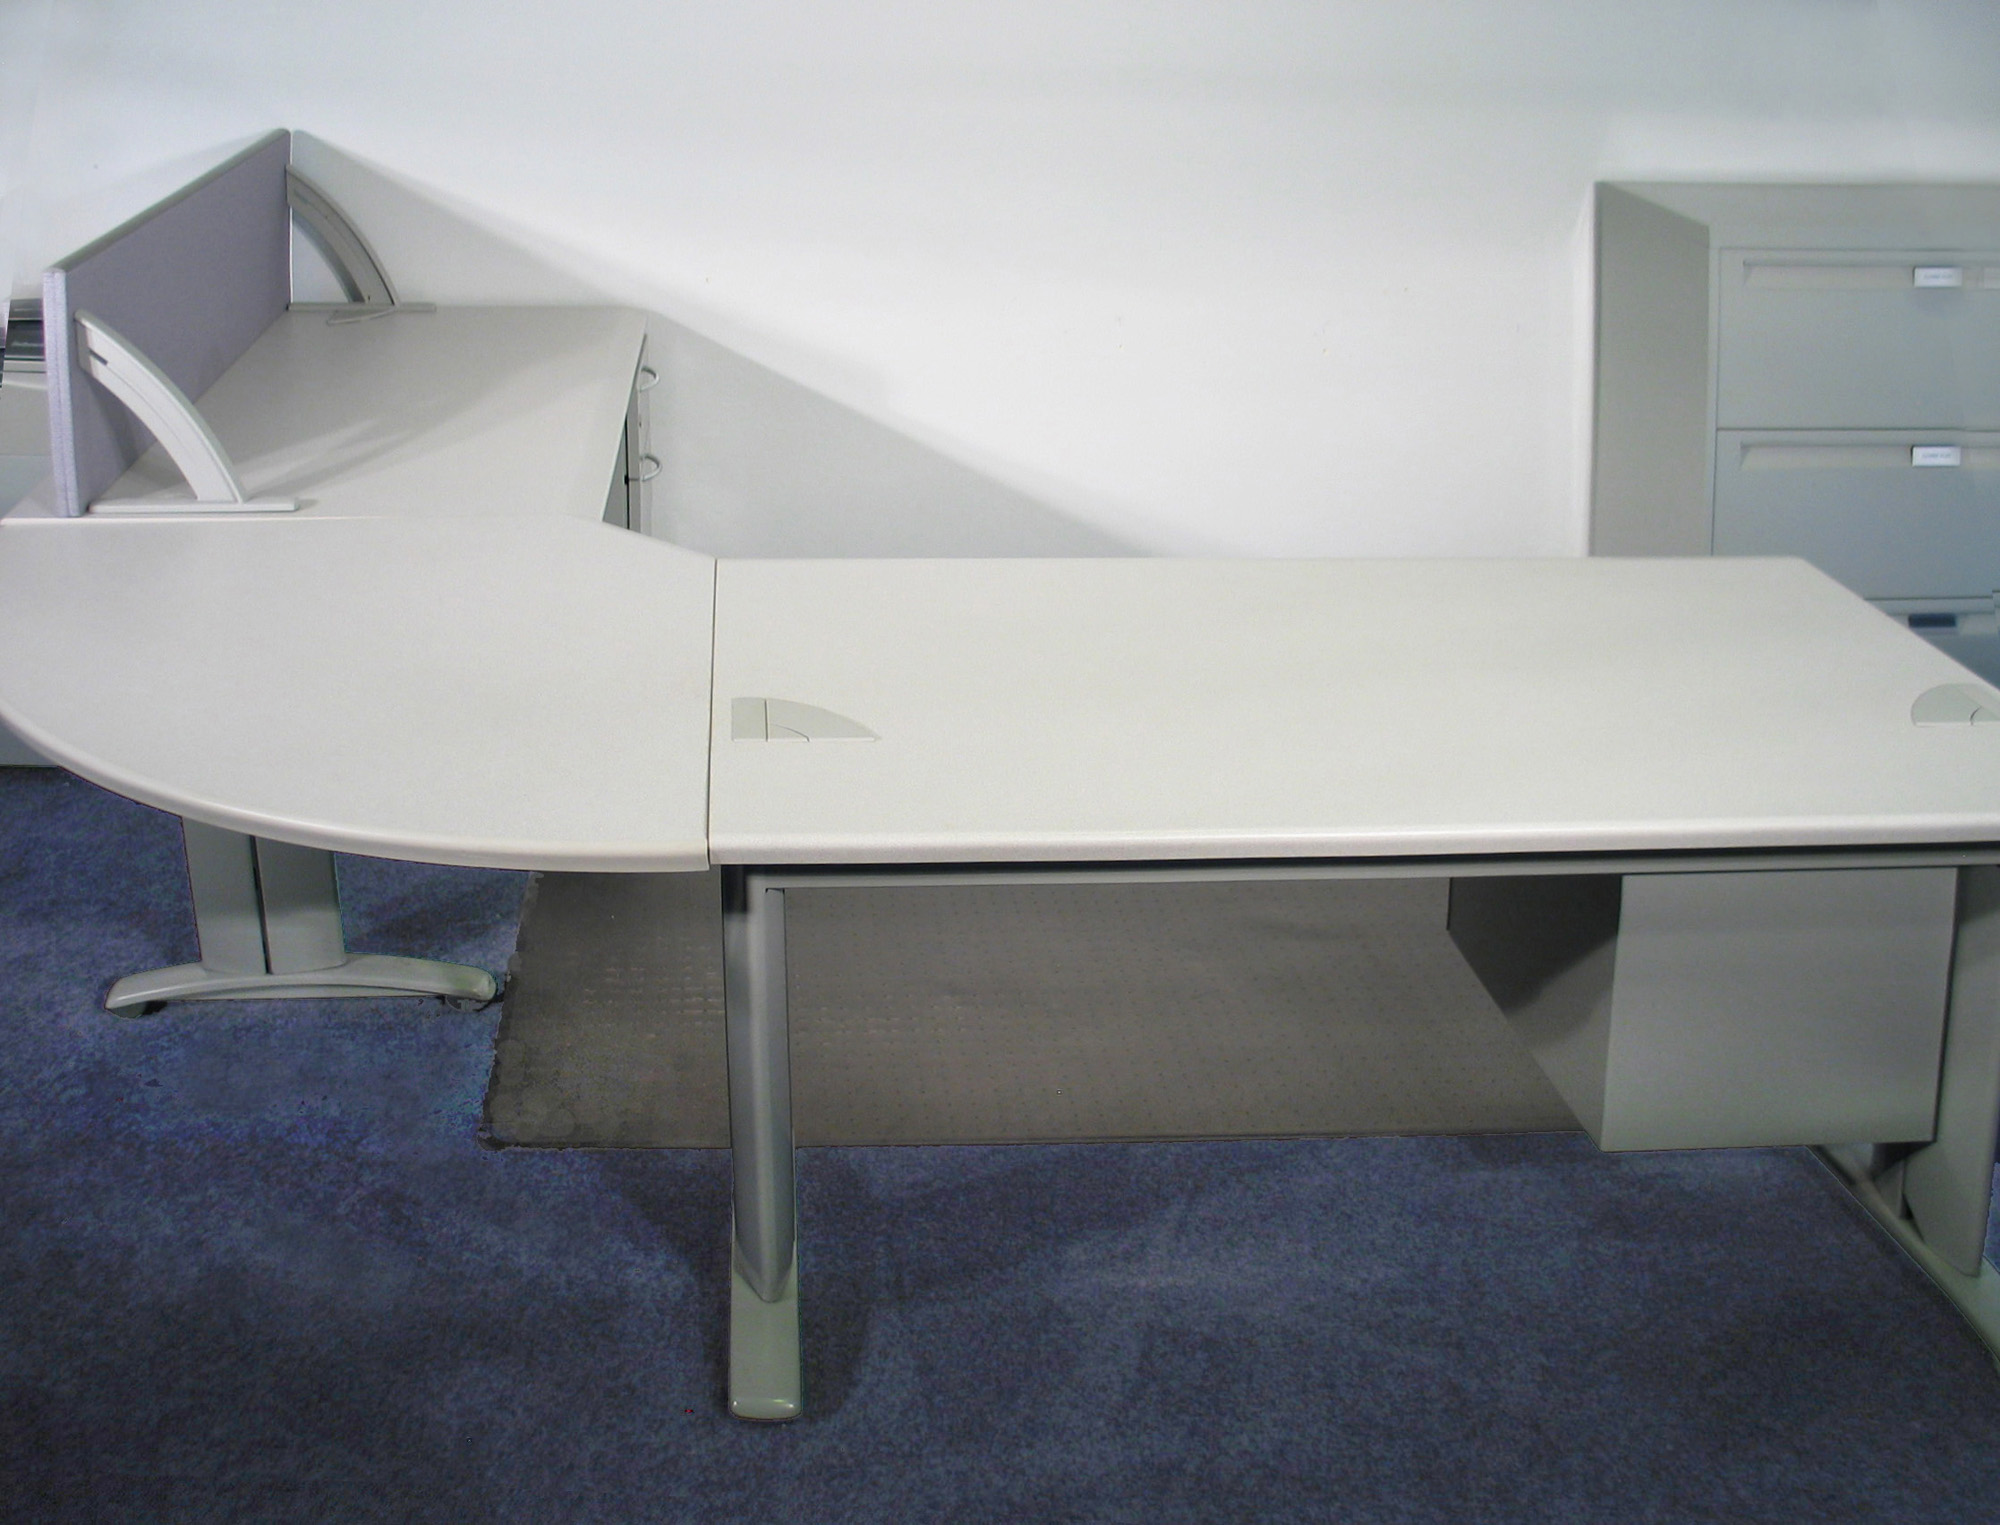 assembled office desks. Assembled 3-Piece Sectional Steelcase Desk System Office Desks